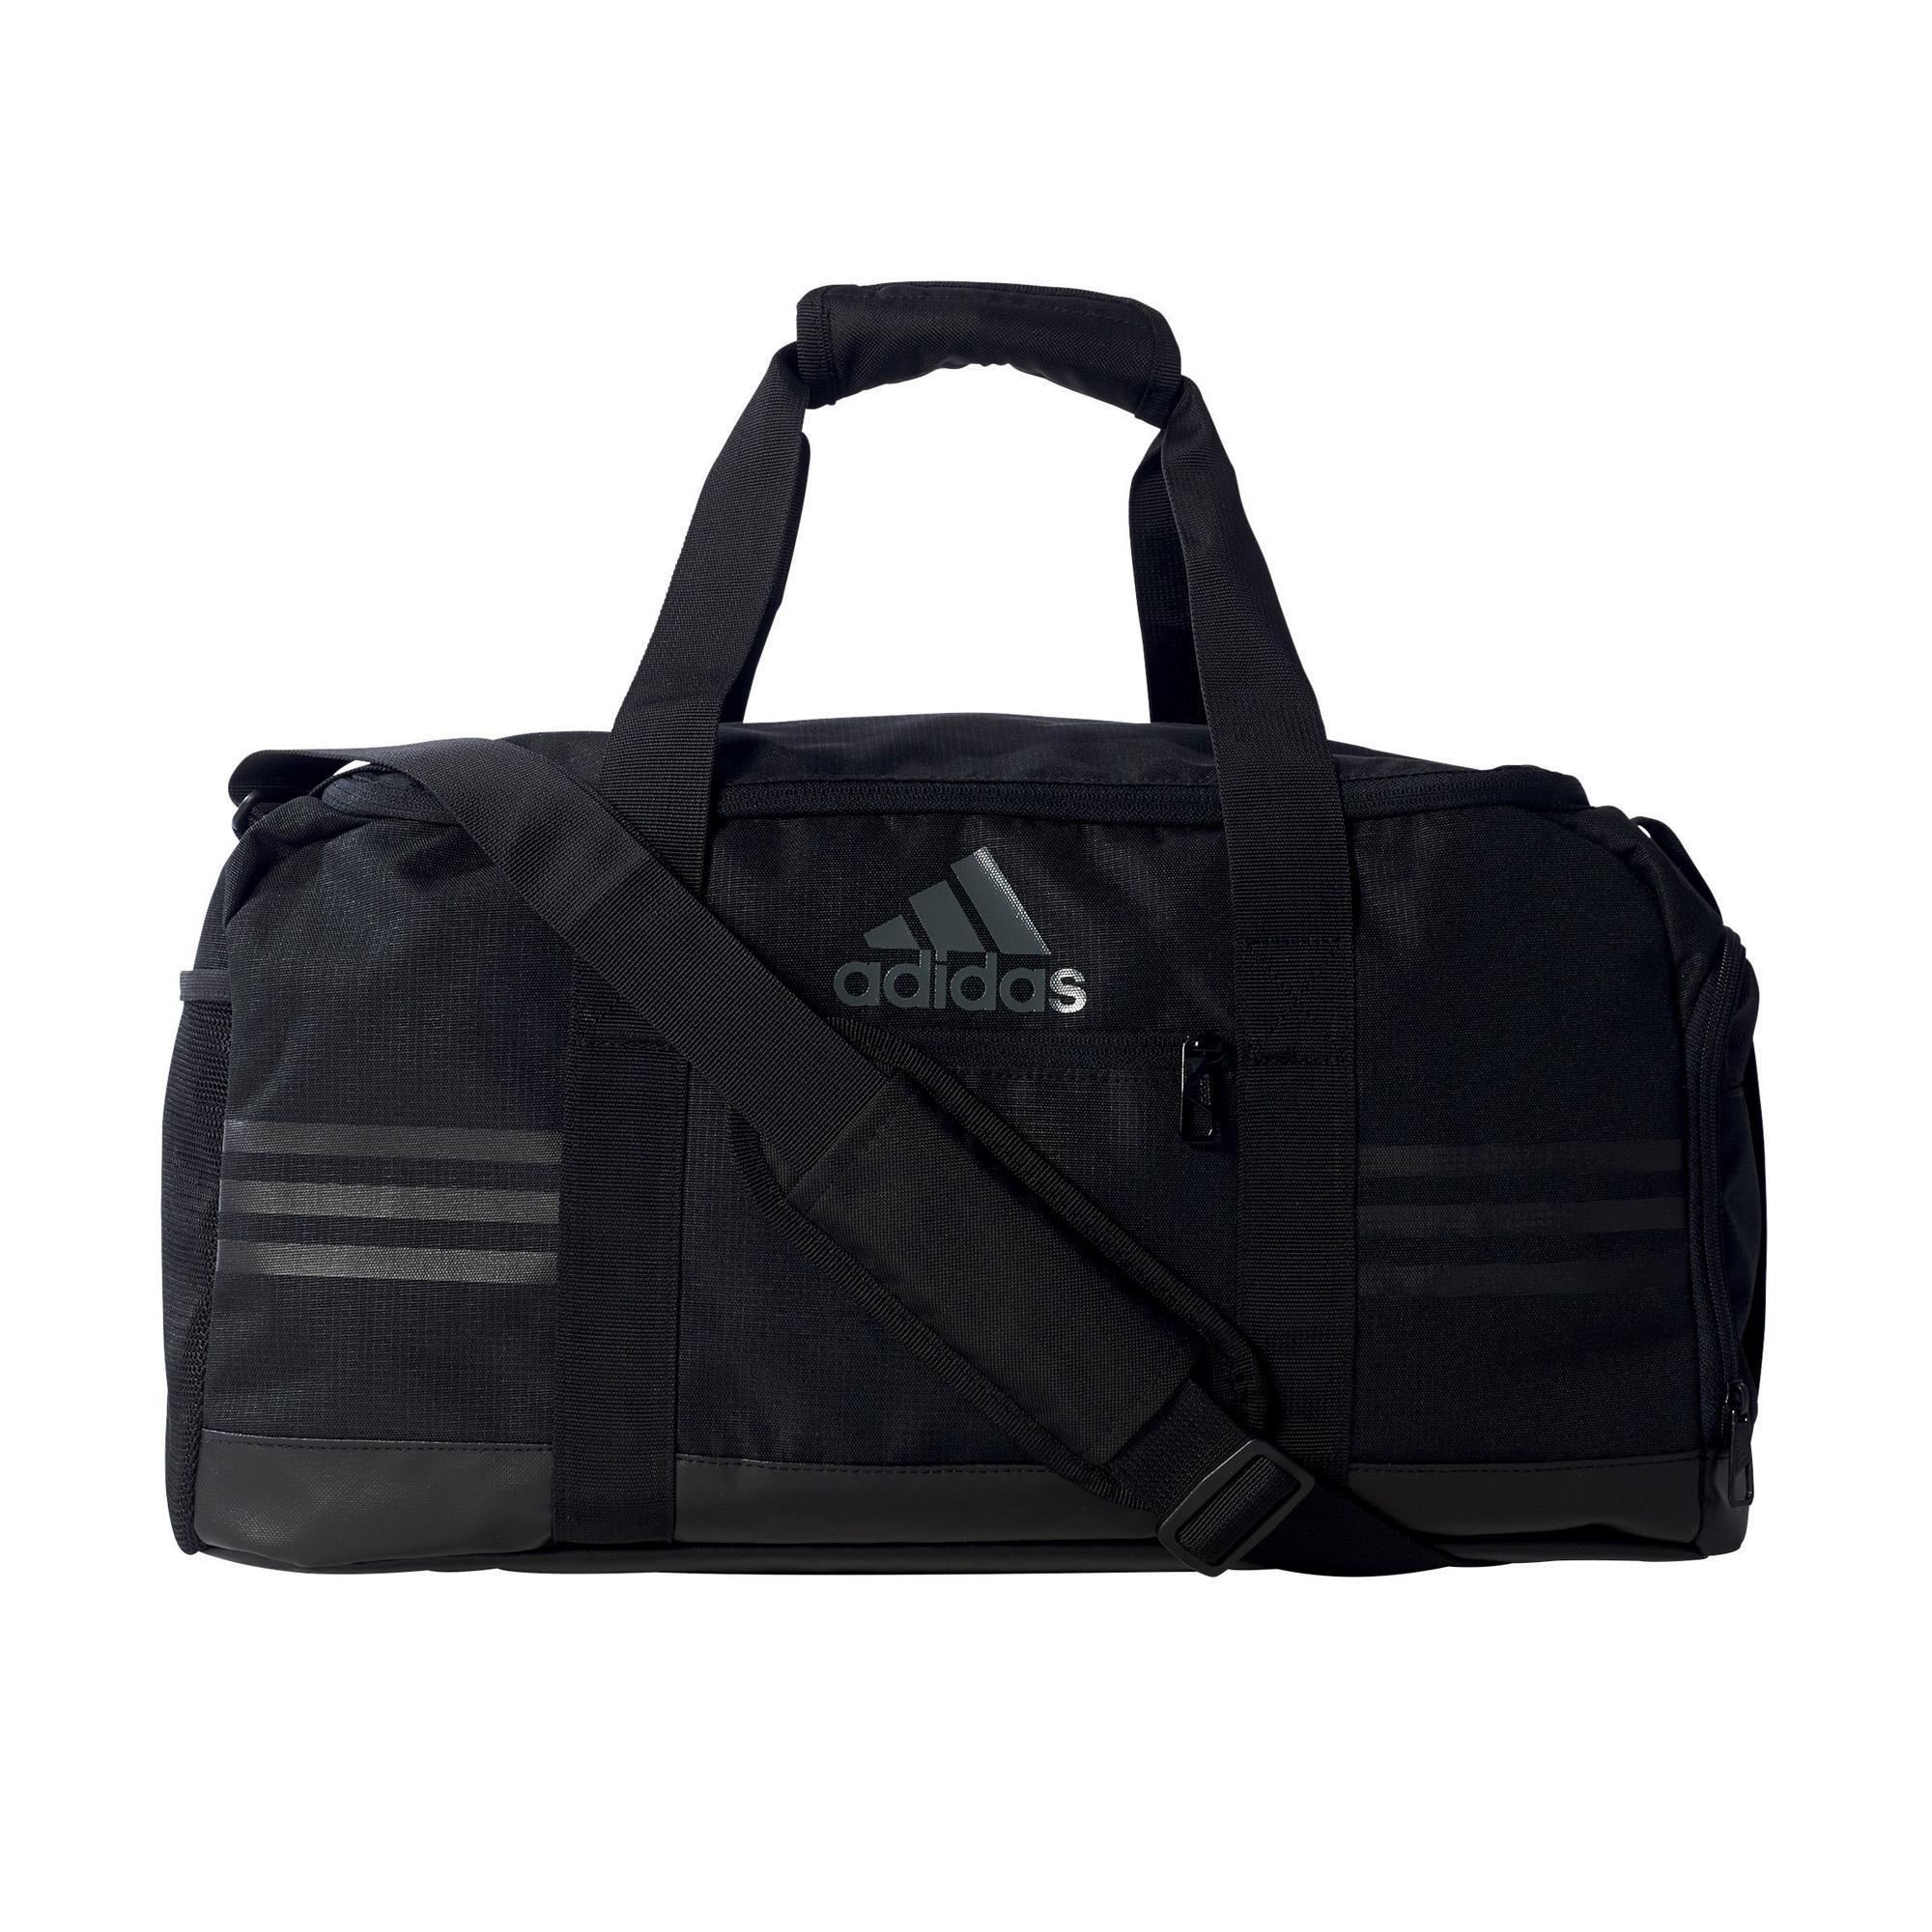 adidas Sporttasche 3S Performance Teambag AJ9997 S